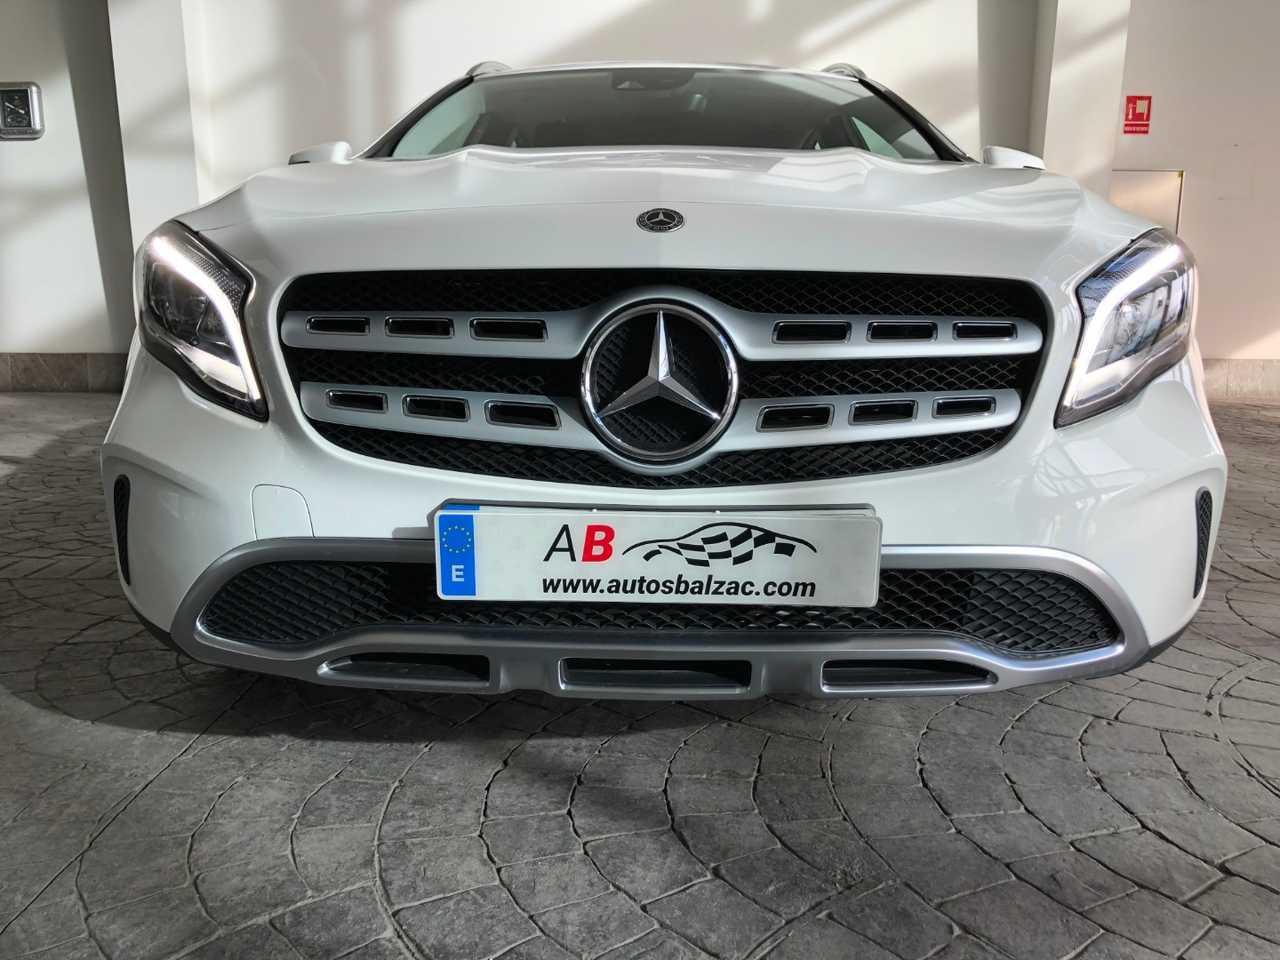 Mercedes GLA 200d 7G-DCT 136cvs   - Foto 1